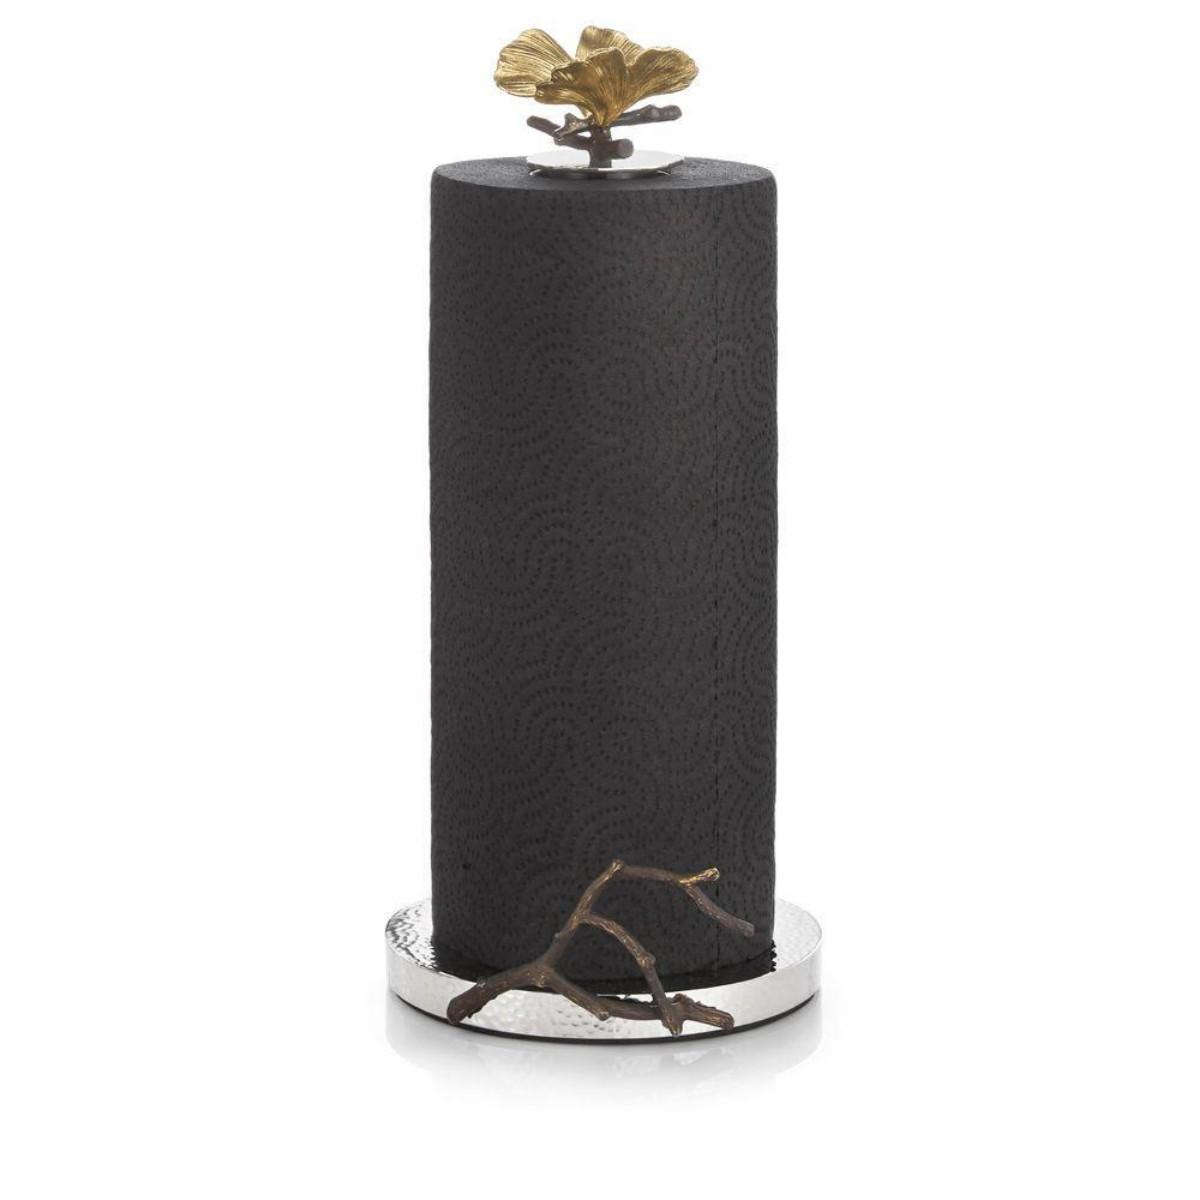 Michael Aram I Butterfly Ginkgo Paper Towel Holder